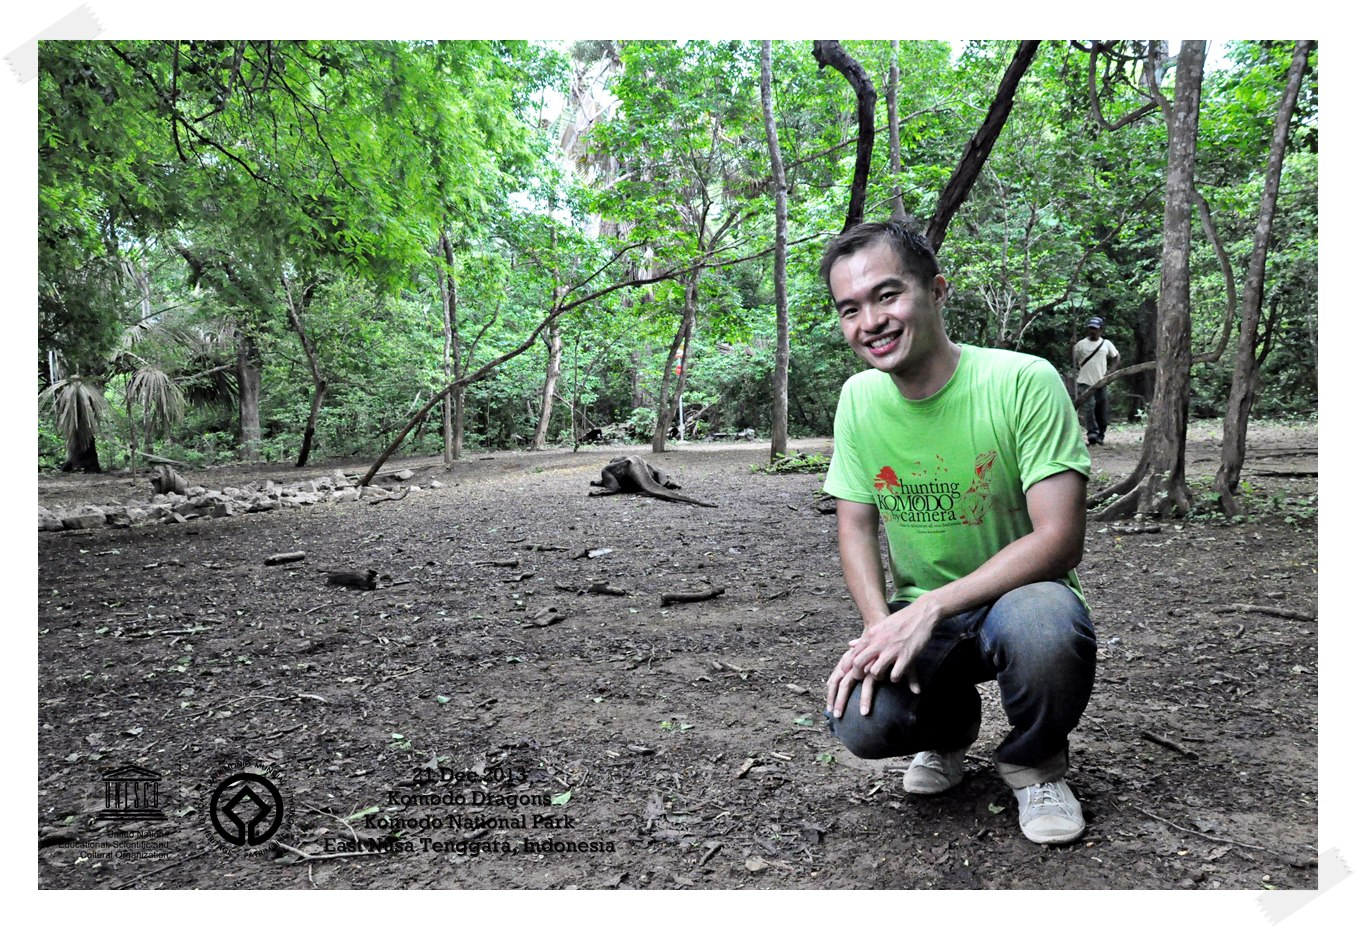 Komodo Giant Lizard Komodo National Park - Indonesia Thomas shaw